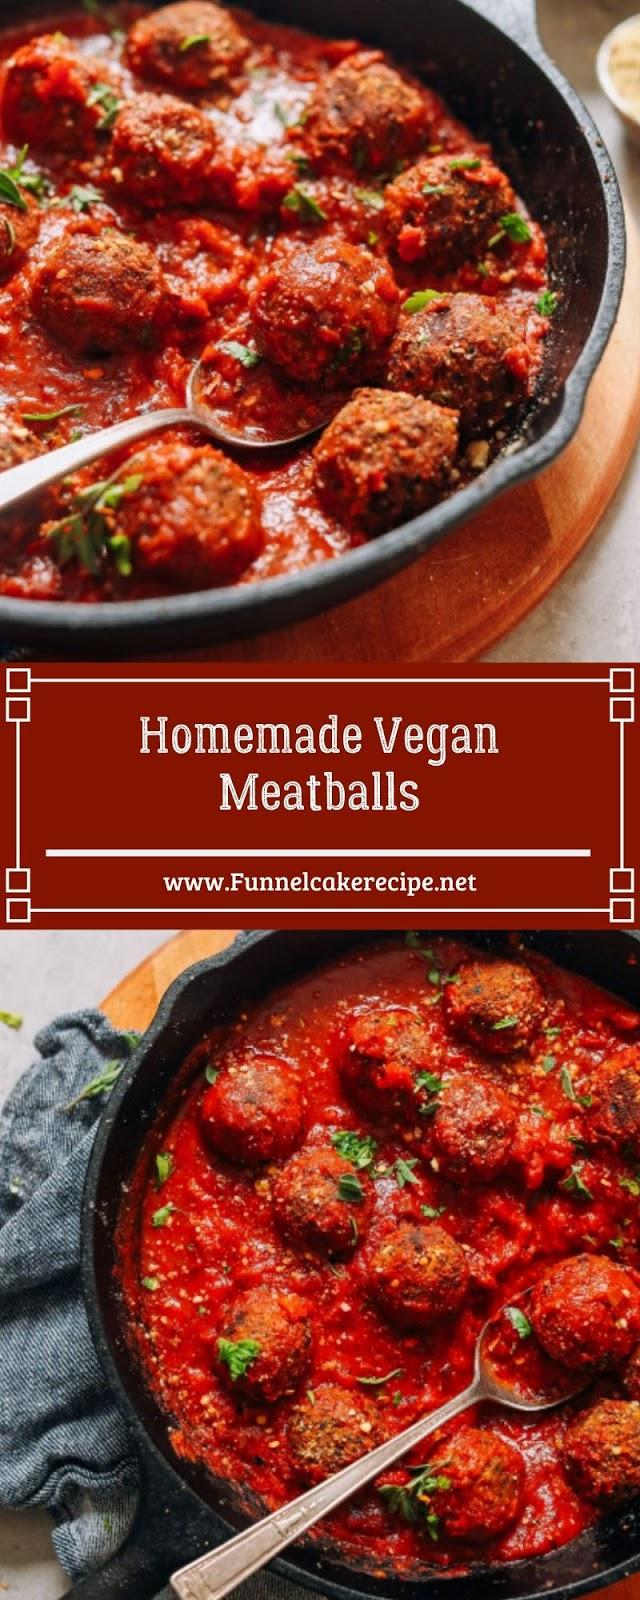 Homemade Vegan Meatballs